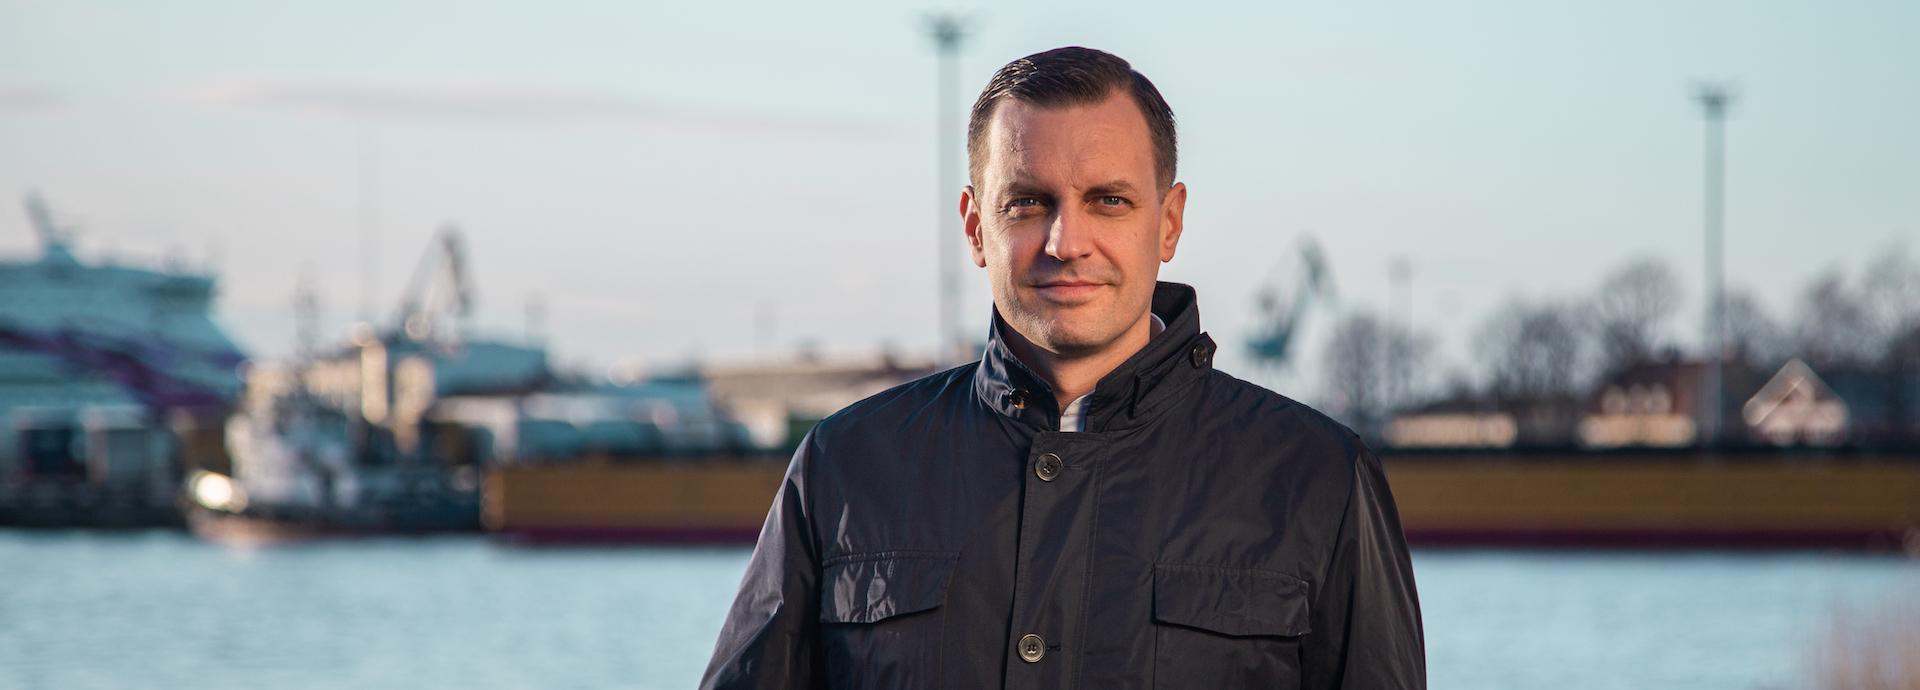 Johnny Kackur, general manager, merchant and gas carrier segment sales, Wärtsilä